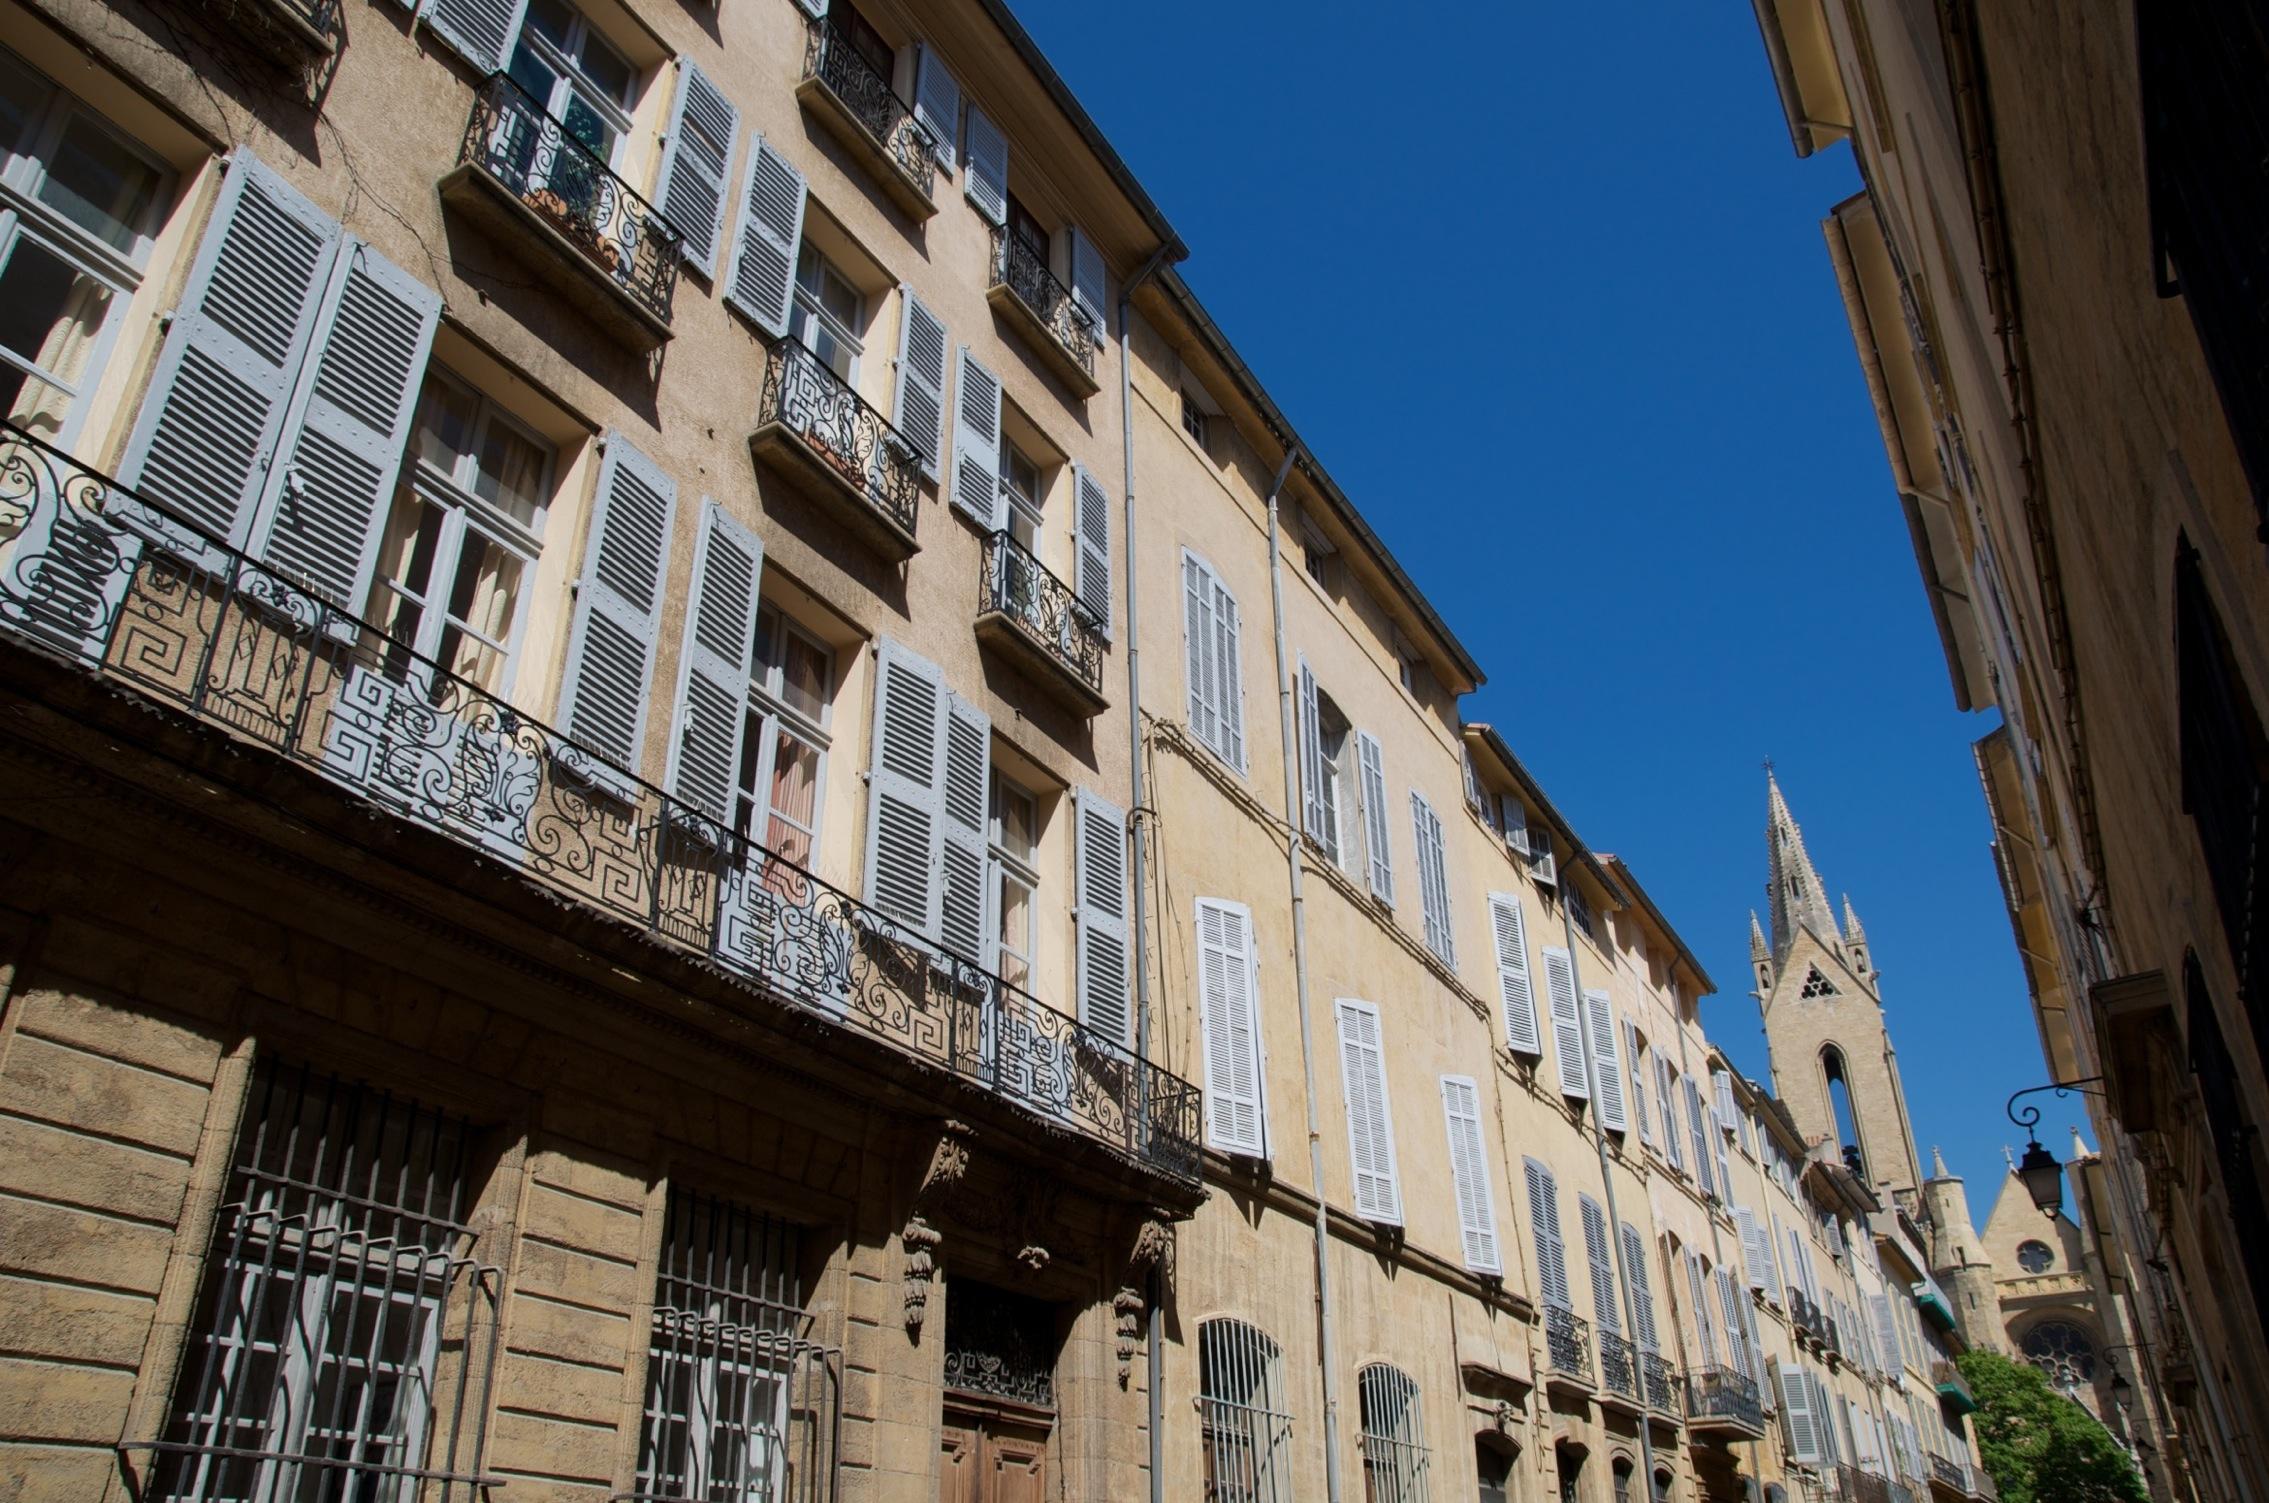 Marseille and Aix-en-Provence - Savannah Page 9